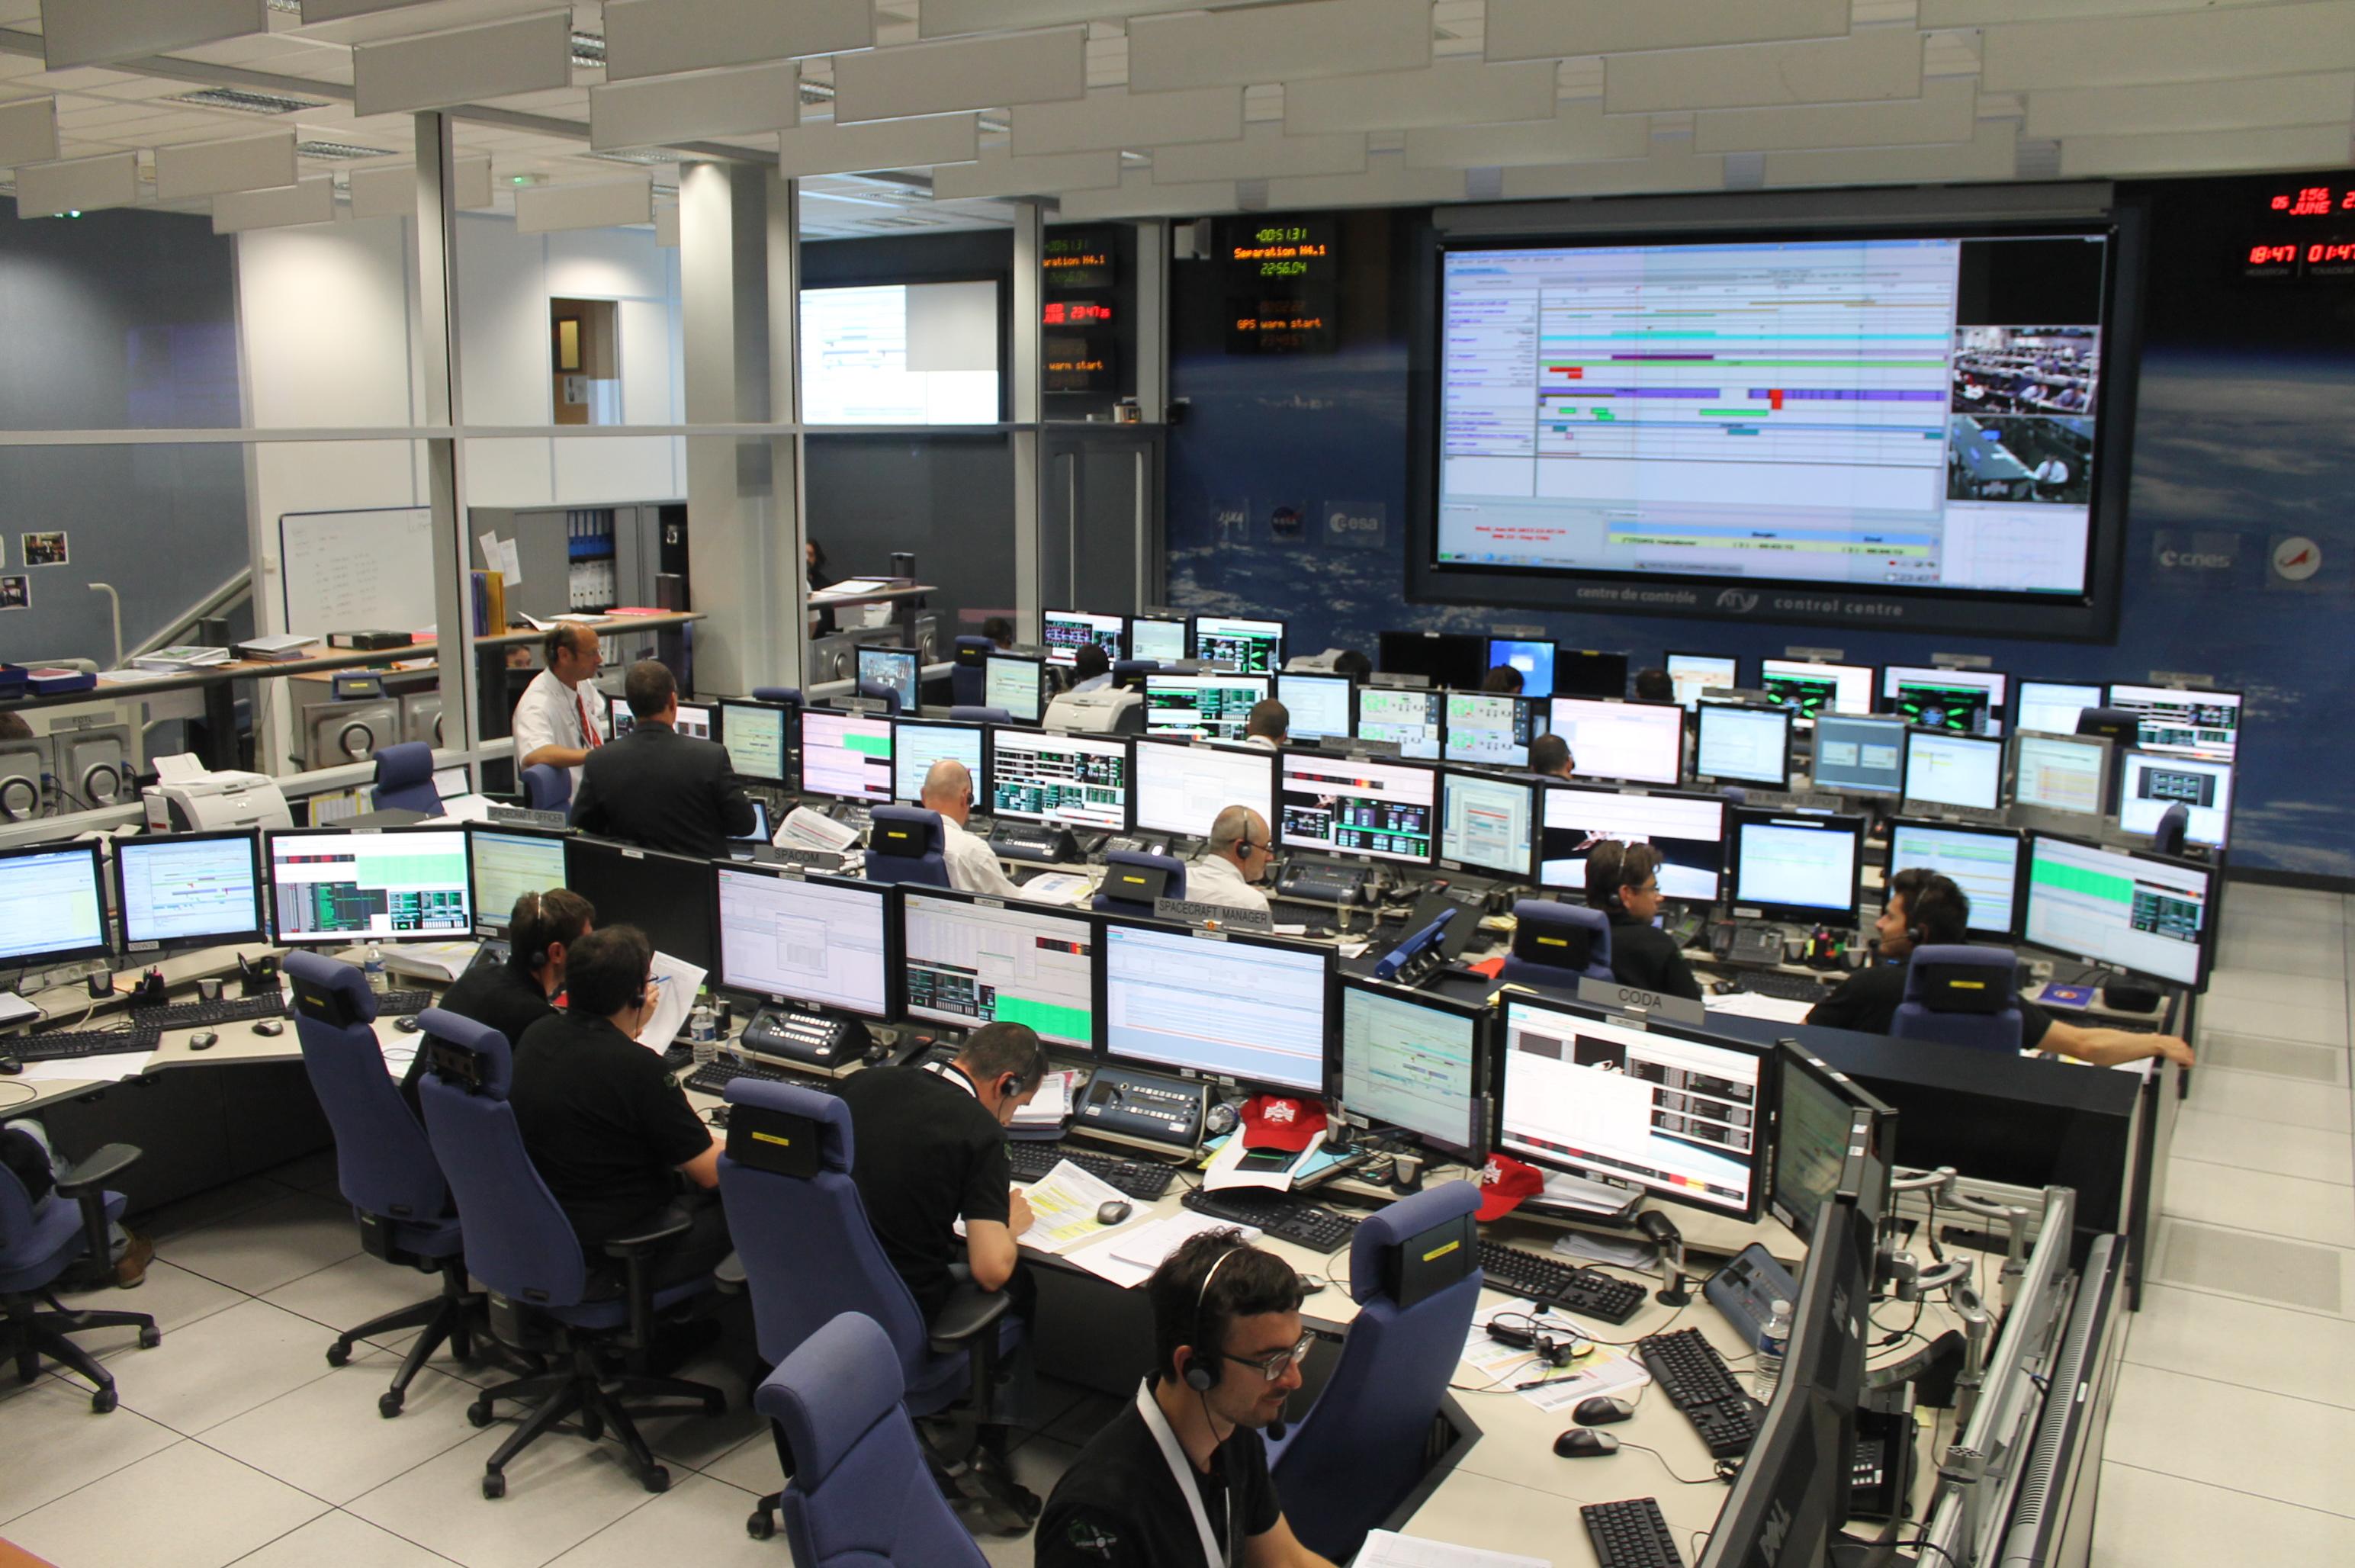 ATV Control Centre During Launch